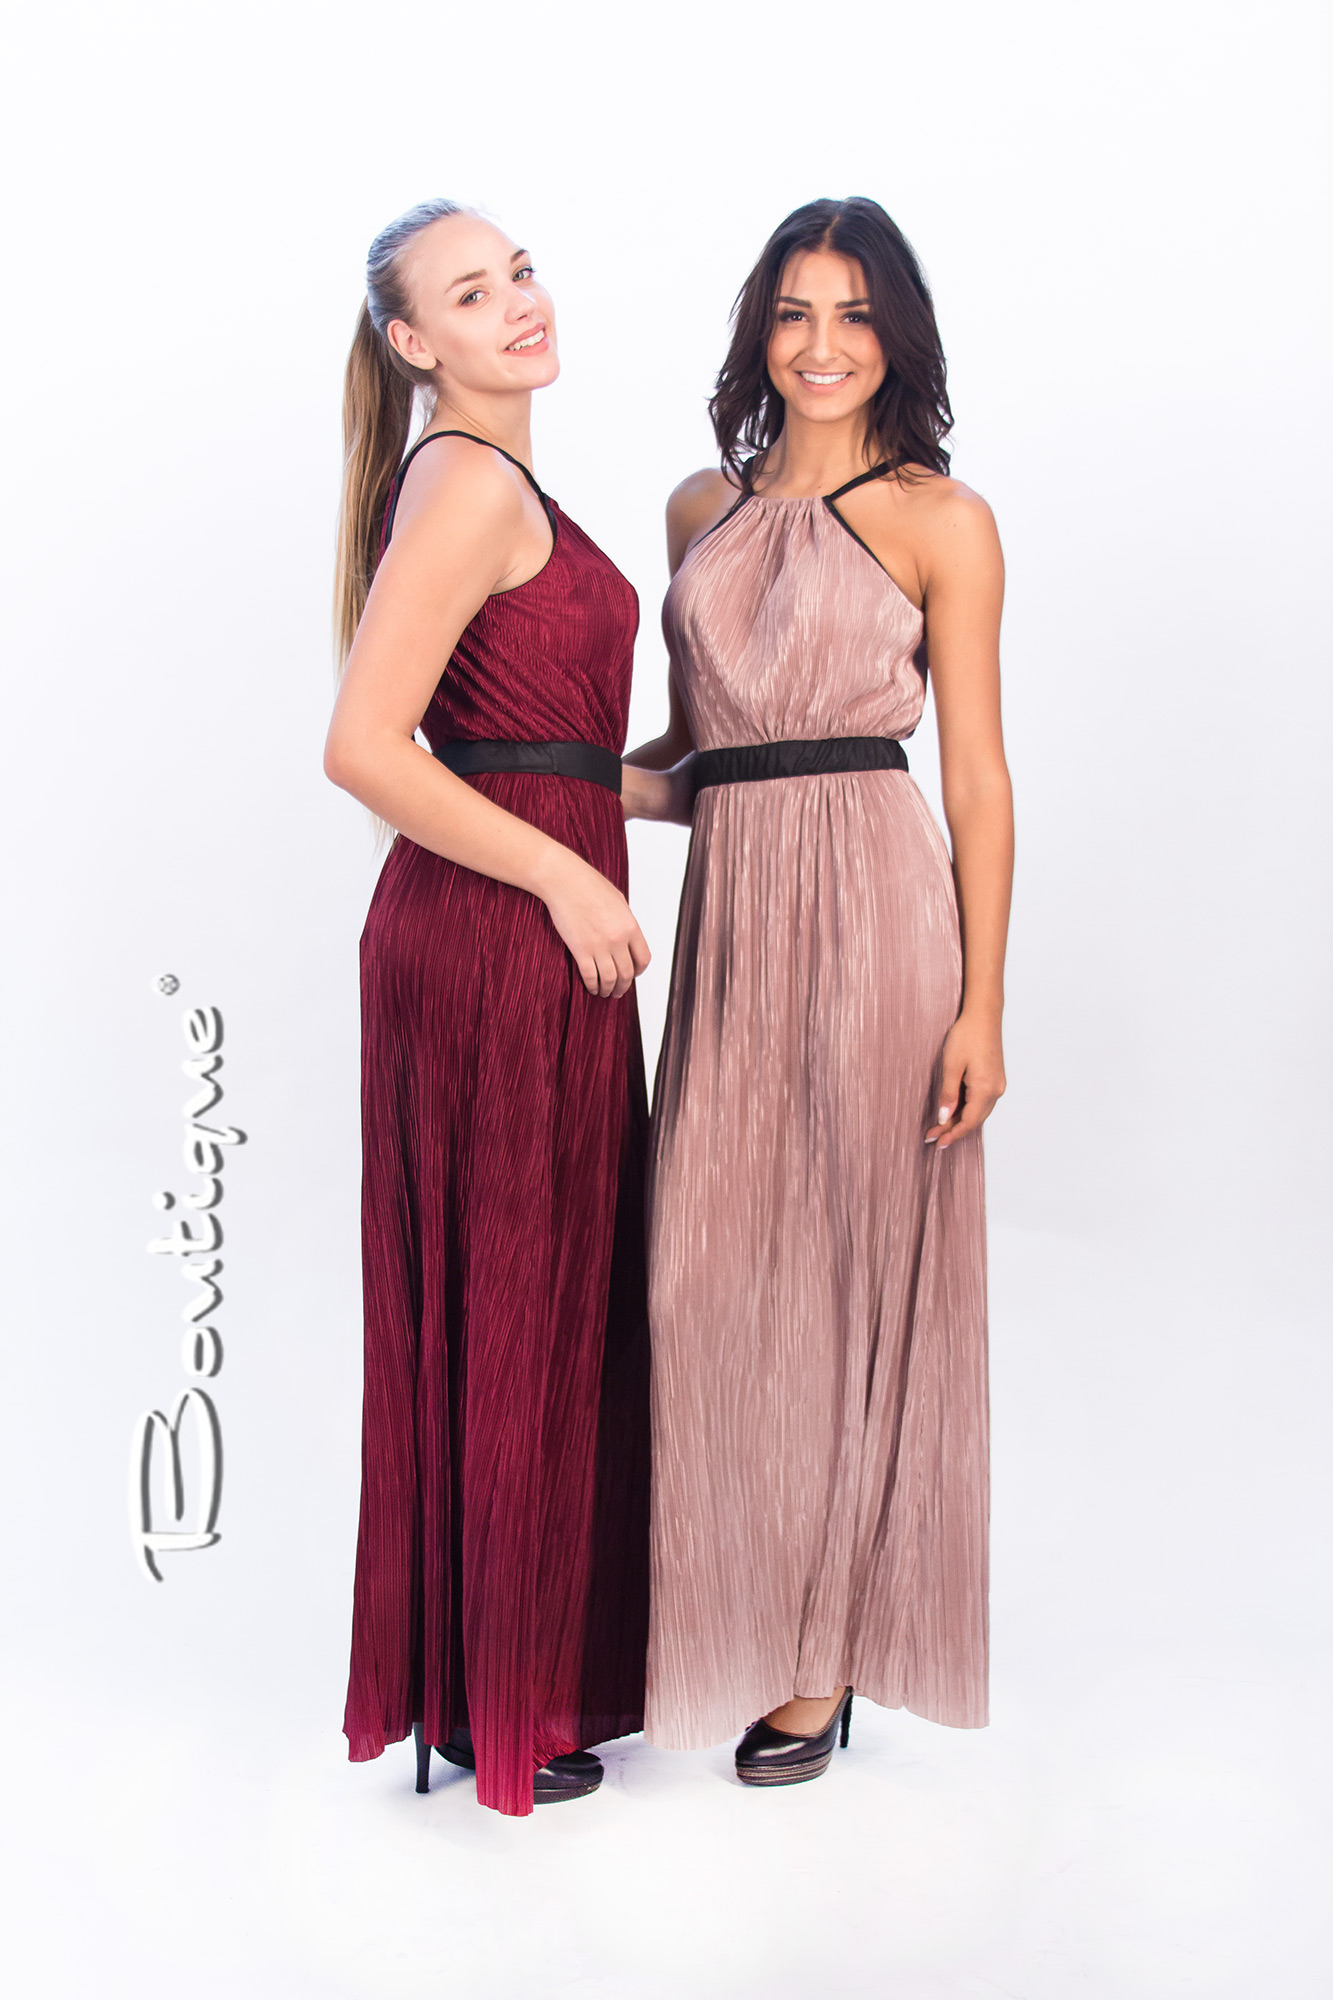 530bcba4e34c Φόρεμα μακρύ αμάνικο πλισέ με δερμάτινη ζώνη - M282 - boutiquefashion.gr